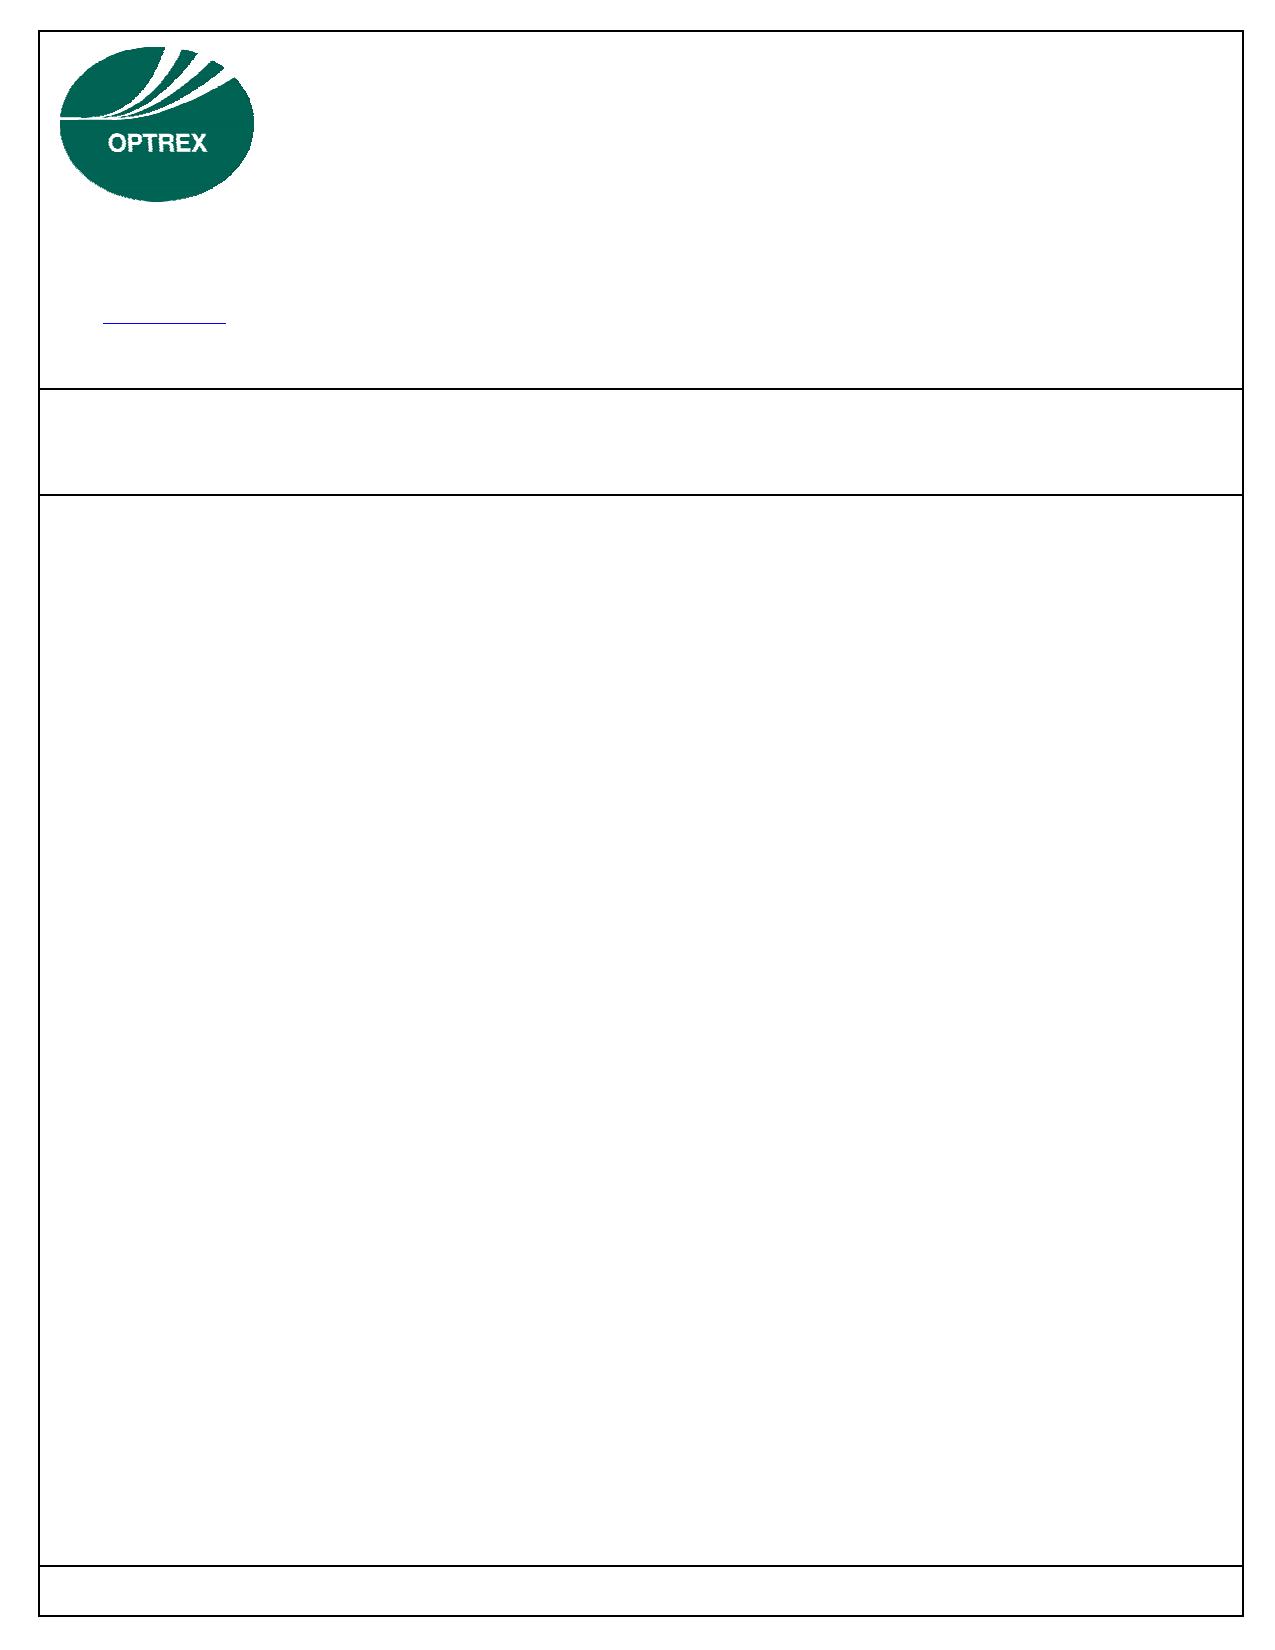 T-51750 datasheet